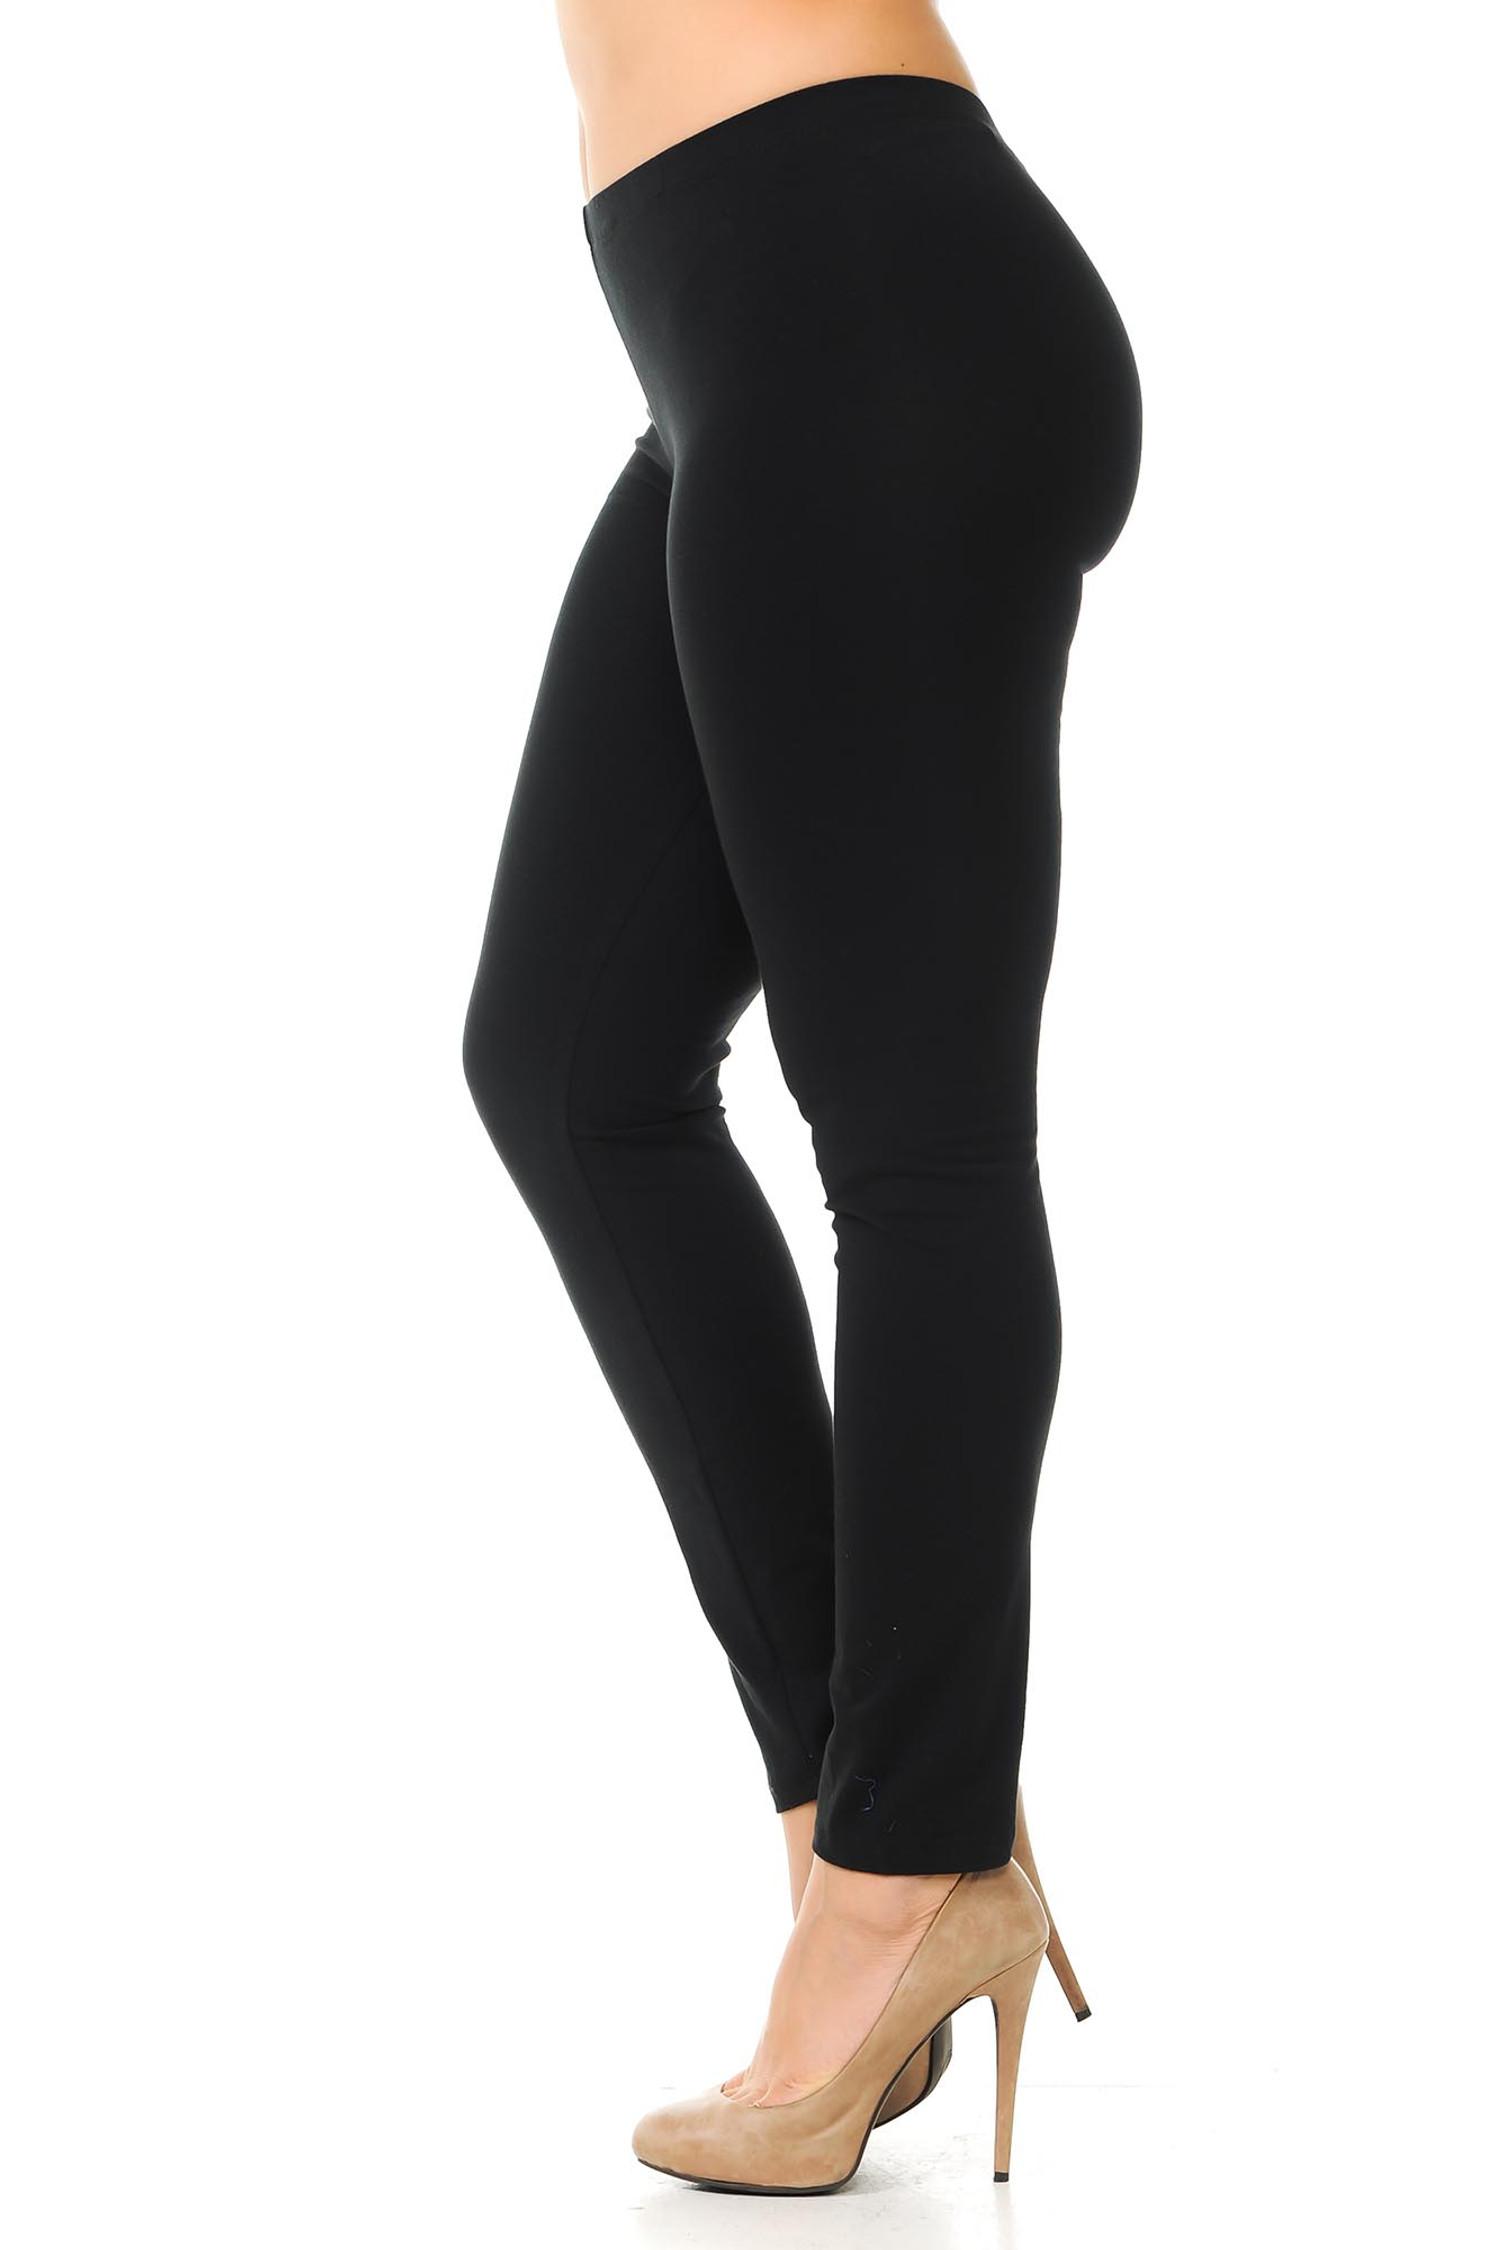 Left side view of  black plus size USA Cotton Full Length Leggings.